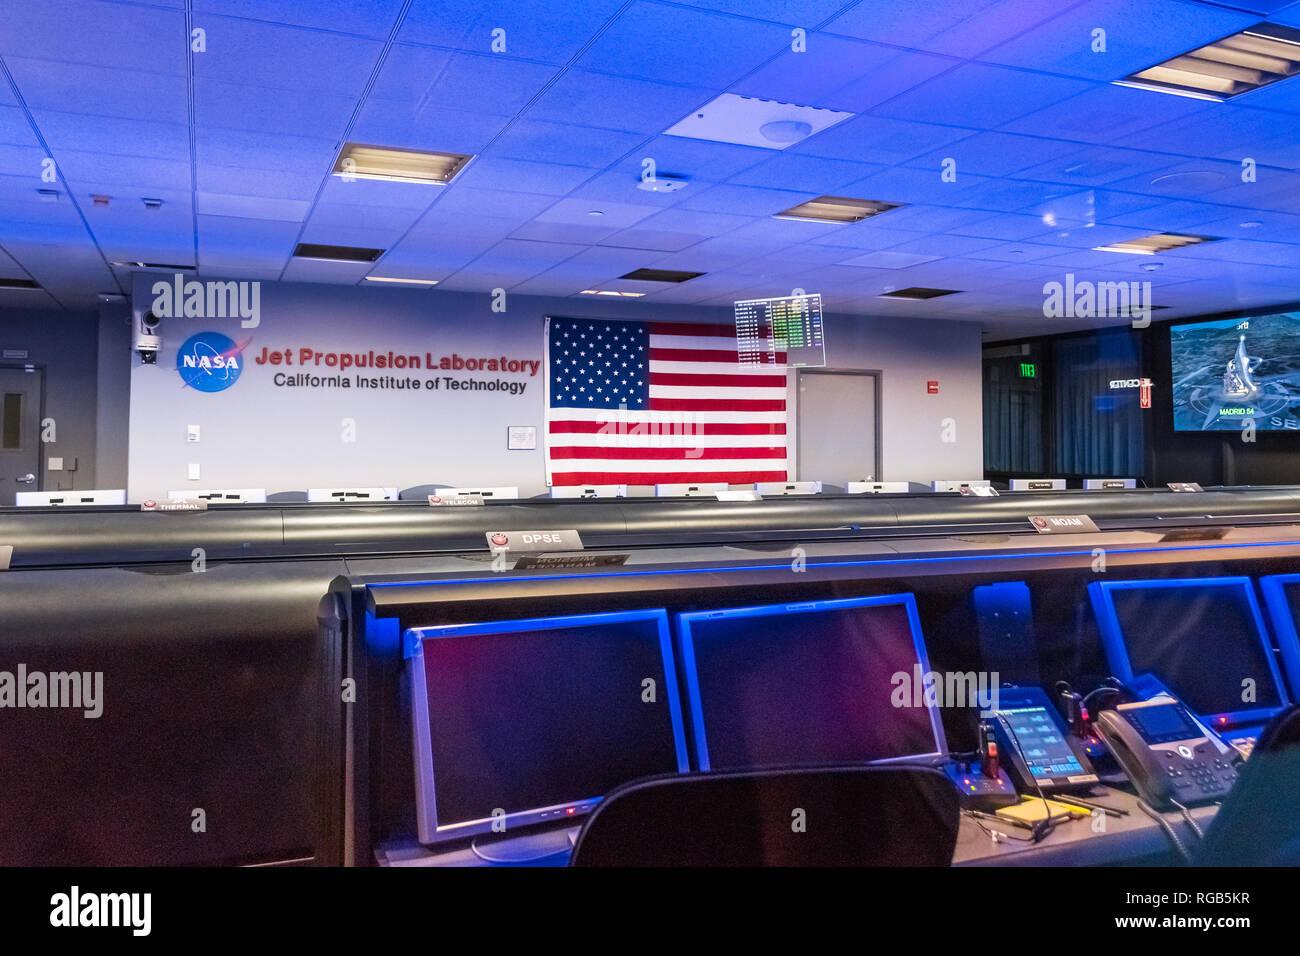 June 10, 2018 La Canada Flintridge / CA / USA -  Inside view of the Mission control center at the Jet Propulsion Laboratory (JPL) - Stock Image